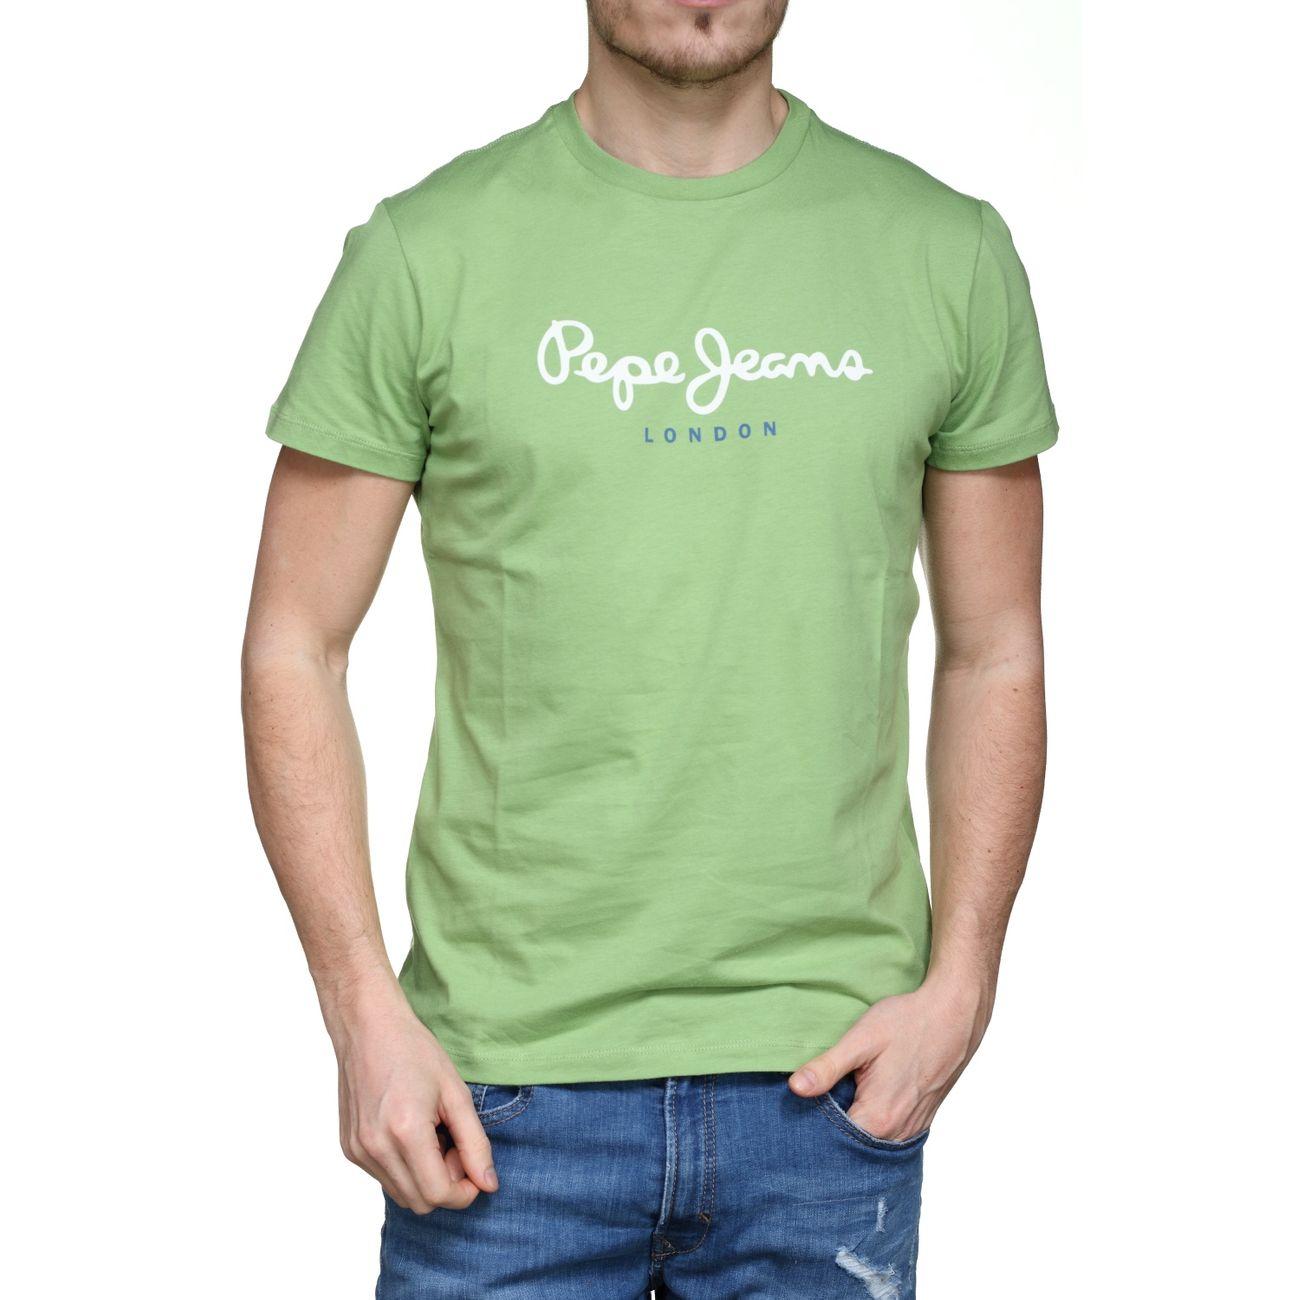 ModeLifestyle Grn Jeans Tee Eggo Homme Pm500465 637 Mallard Pepe Shirt 5jL4AR